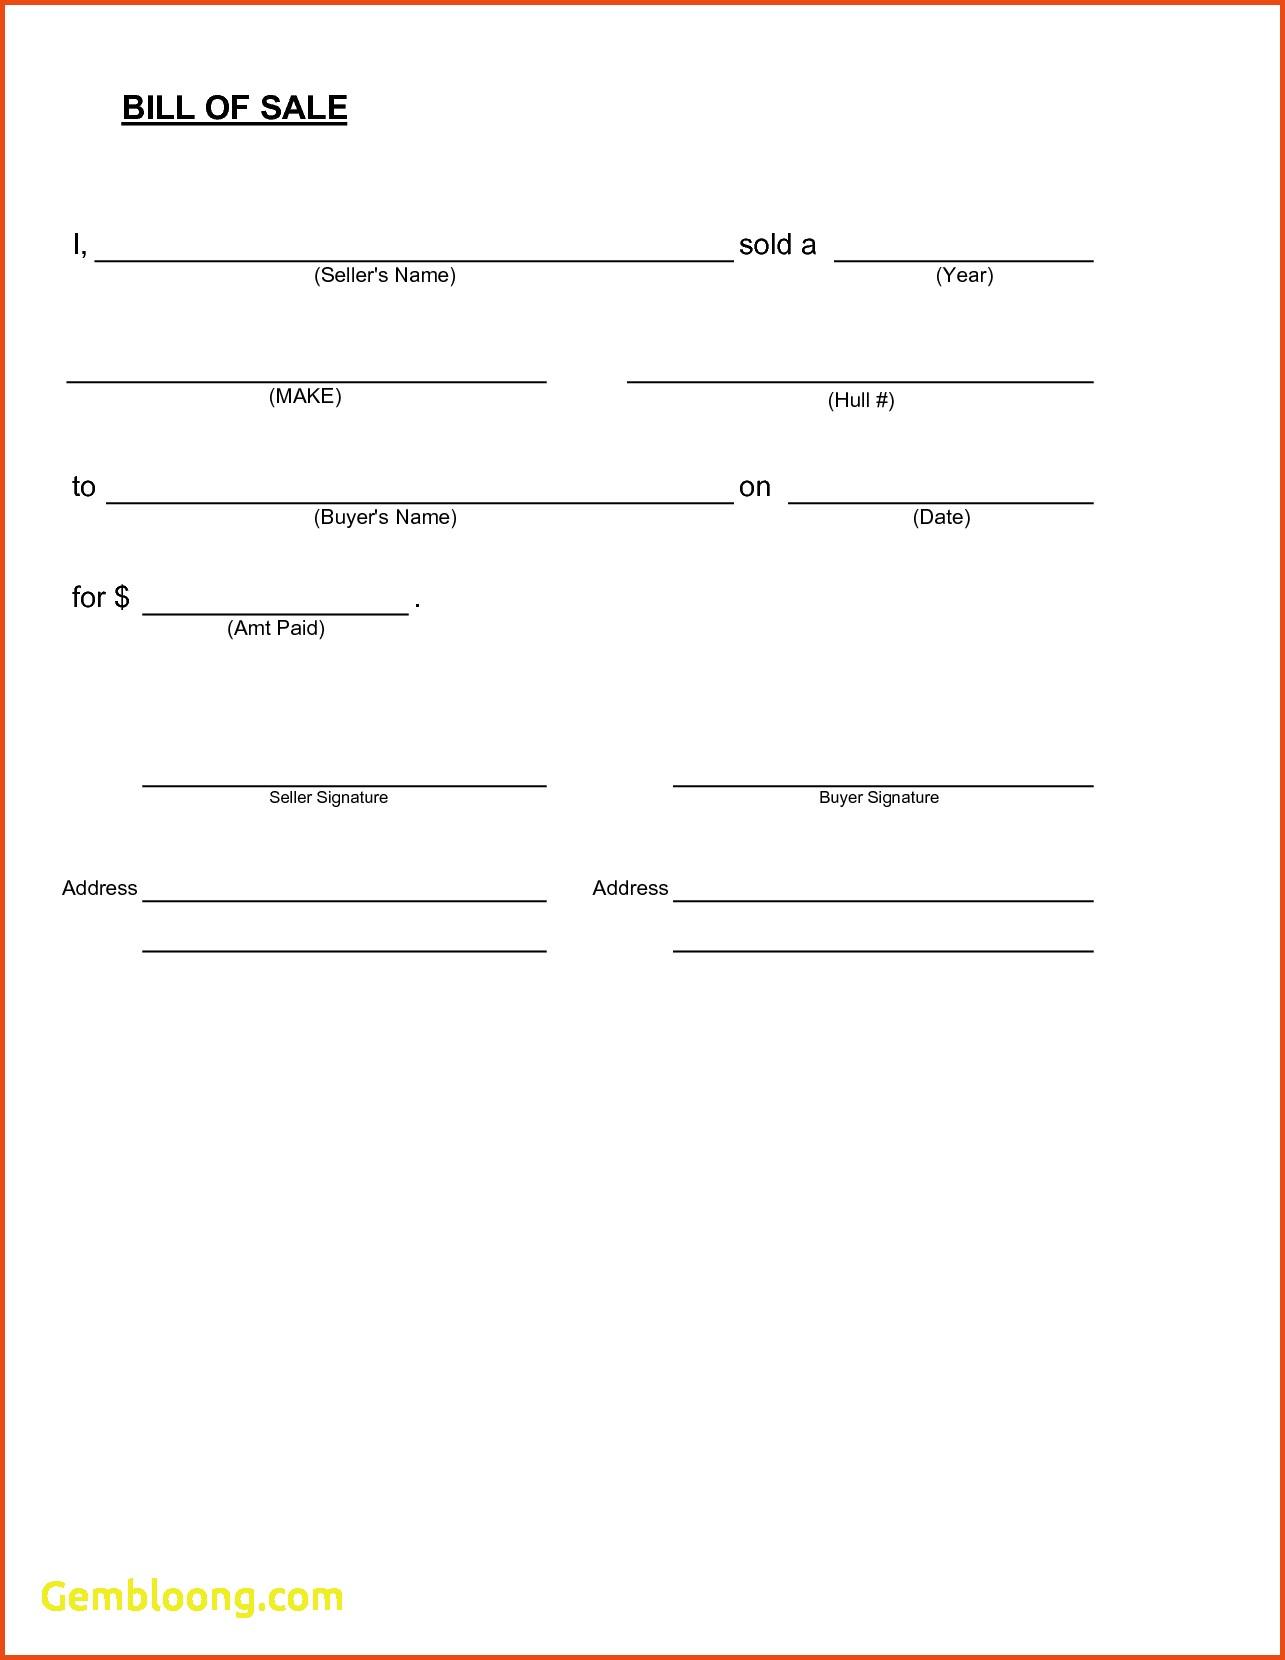 blank bill of sale form printable   Ibov.jonathandedecker.com